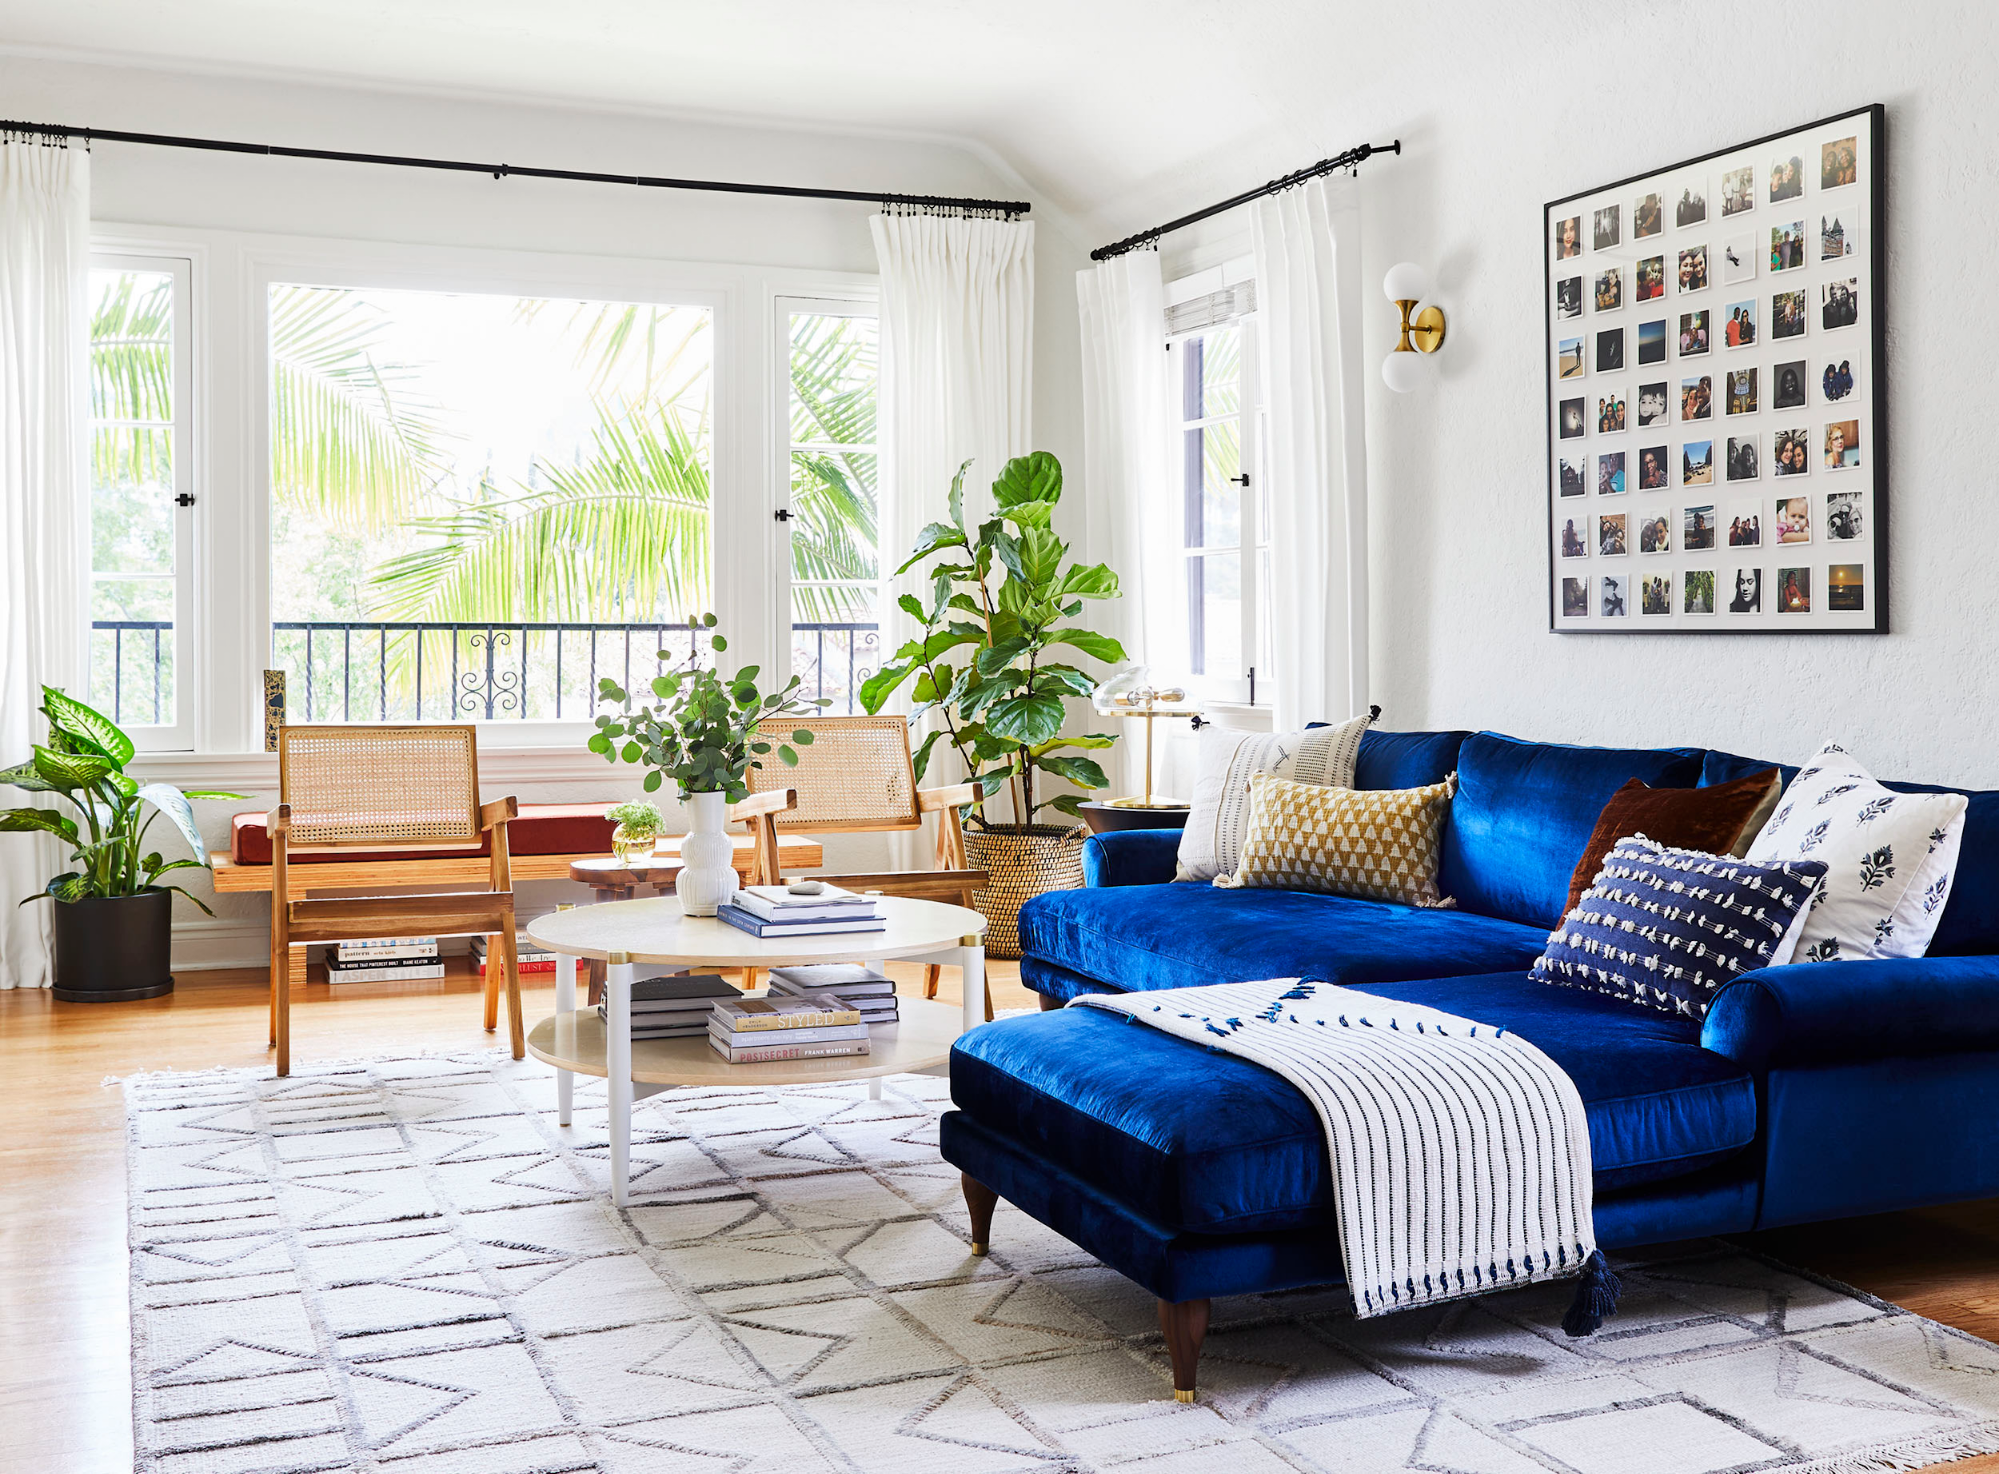 The Best Modern Living Room Decorating Ideas - Gorgeous Modern